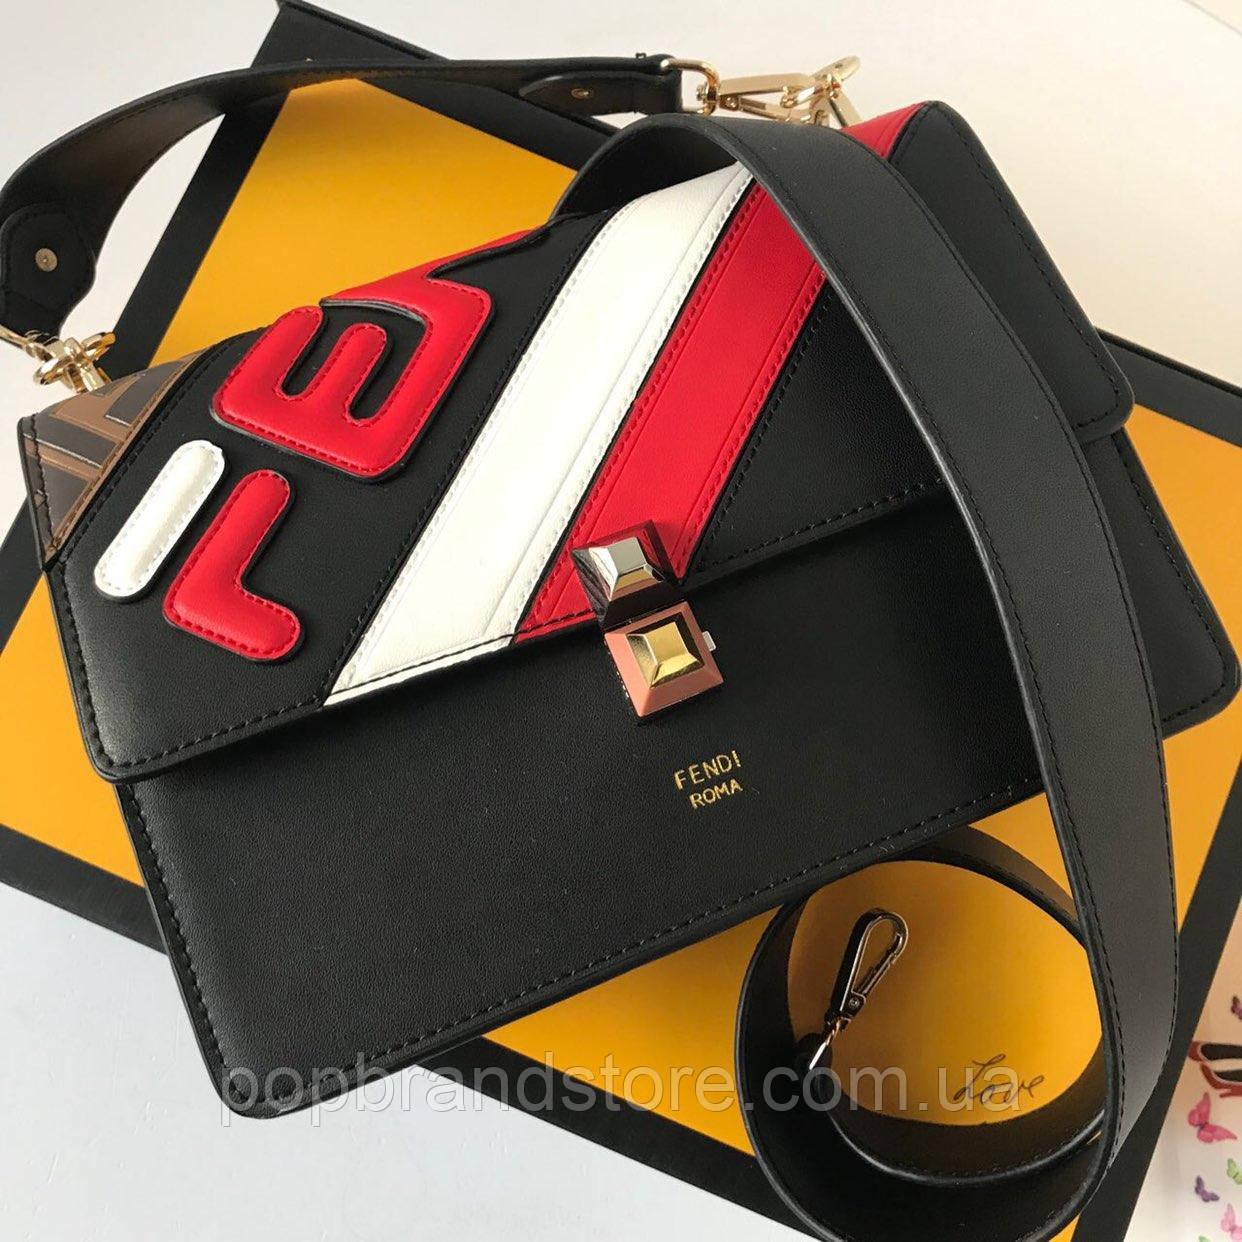 e7505e7be772 Модная сумочка FENDI Kan I (реплика) - Pop Brand Store | брендовые сумки,